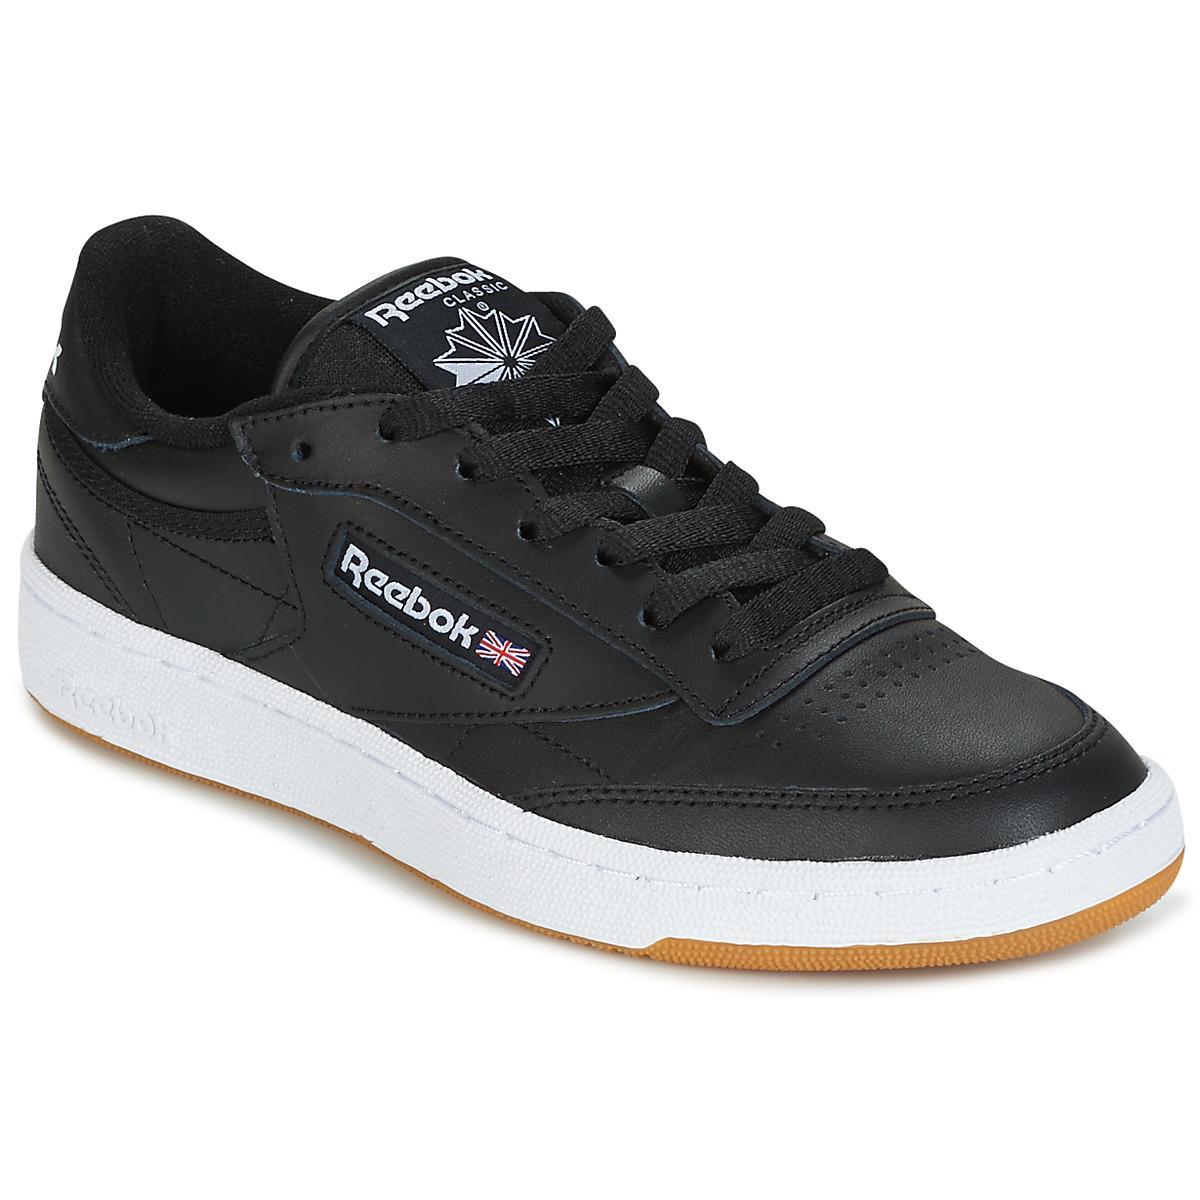 3f99bac688 Reebok Club C 85 C Women's Shoes (trainers) In Black in Black - Lyst